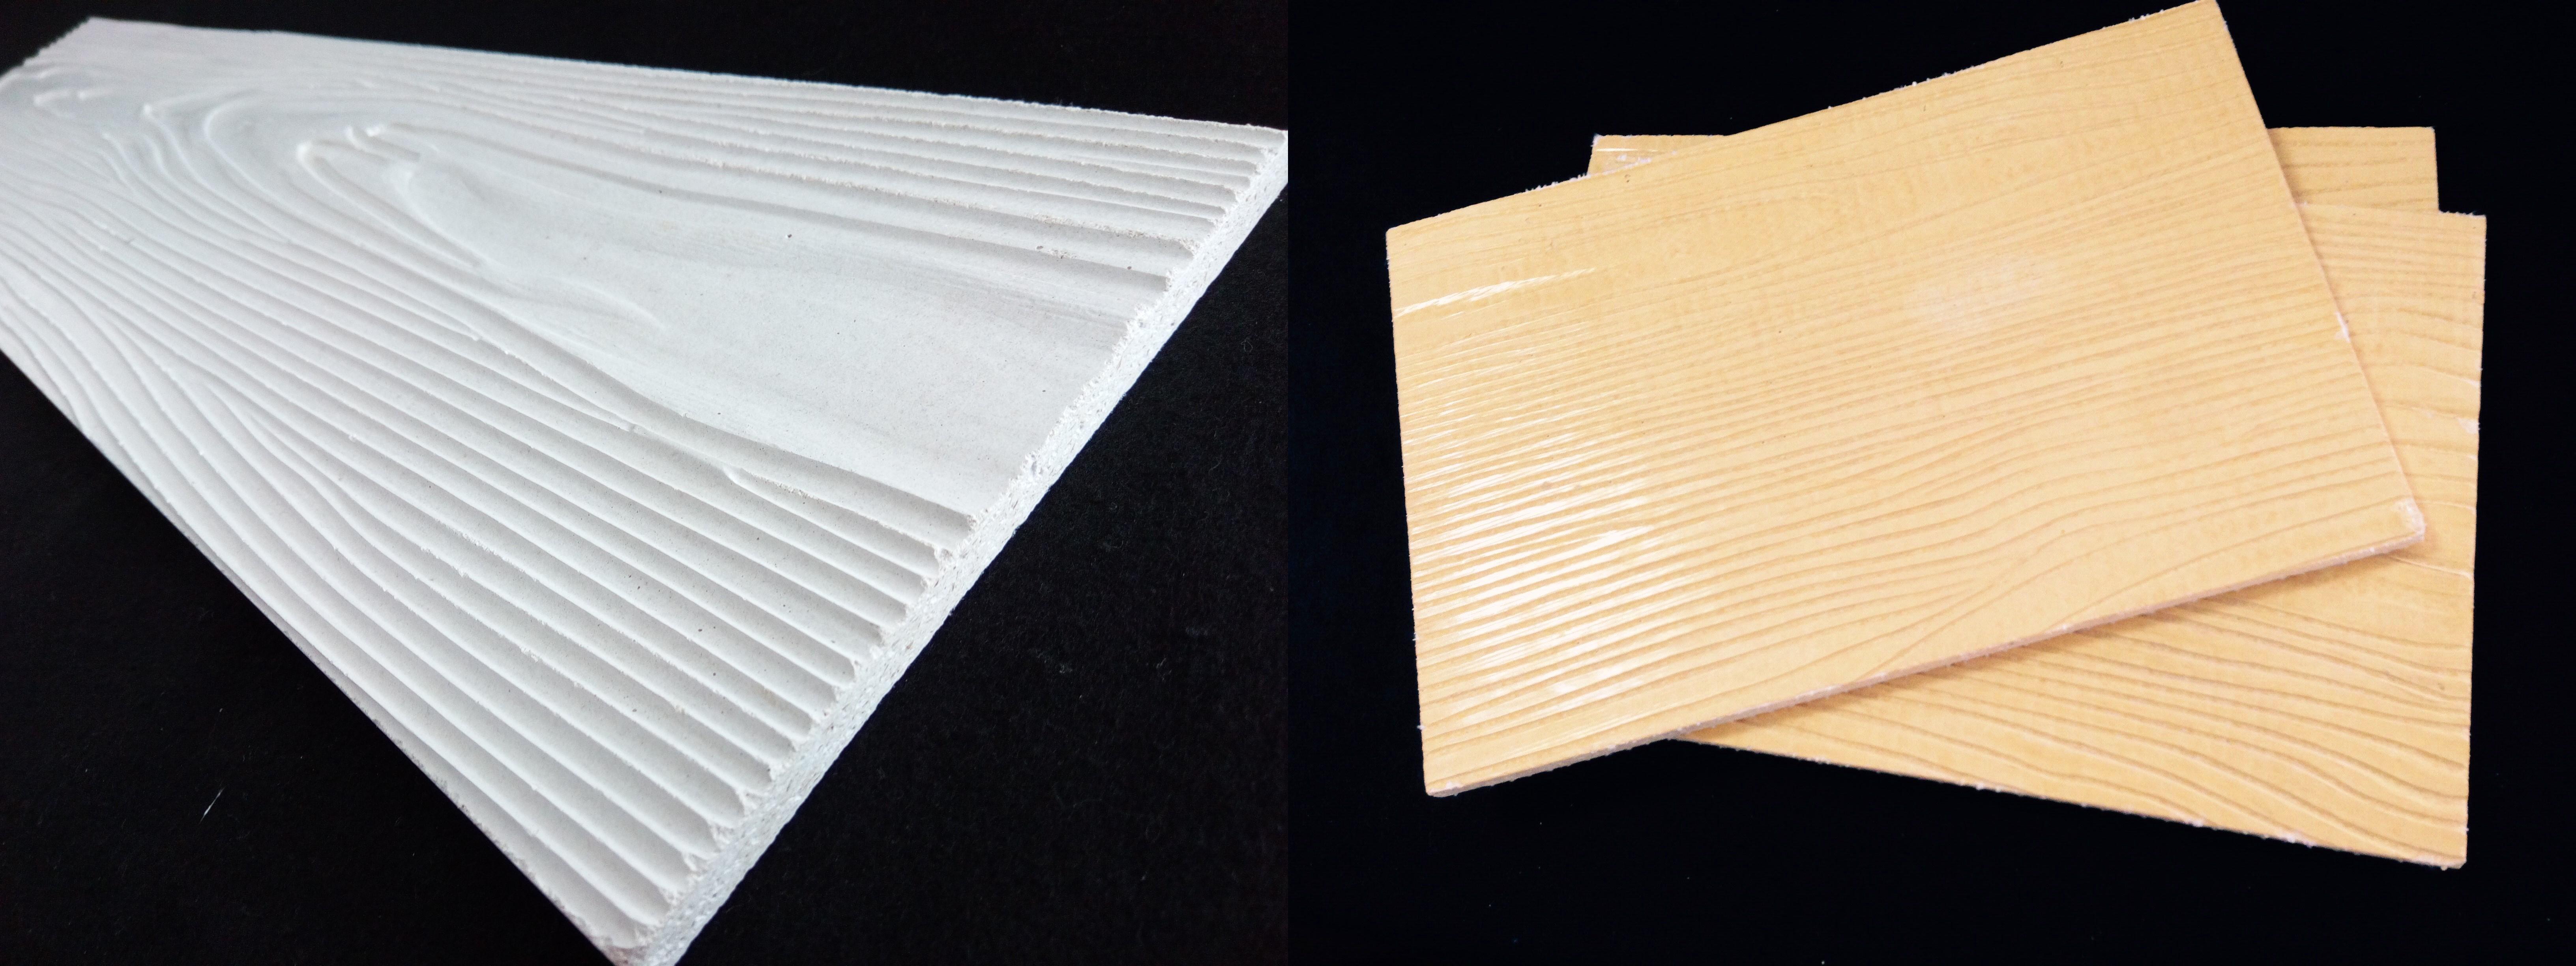 wood grain mgo board